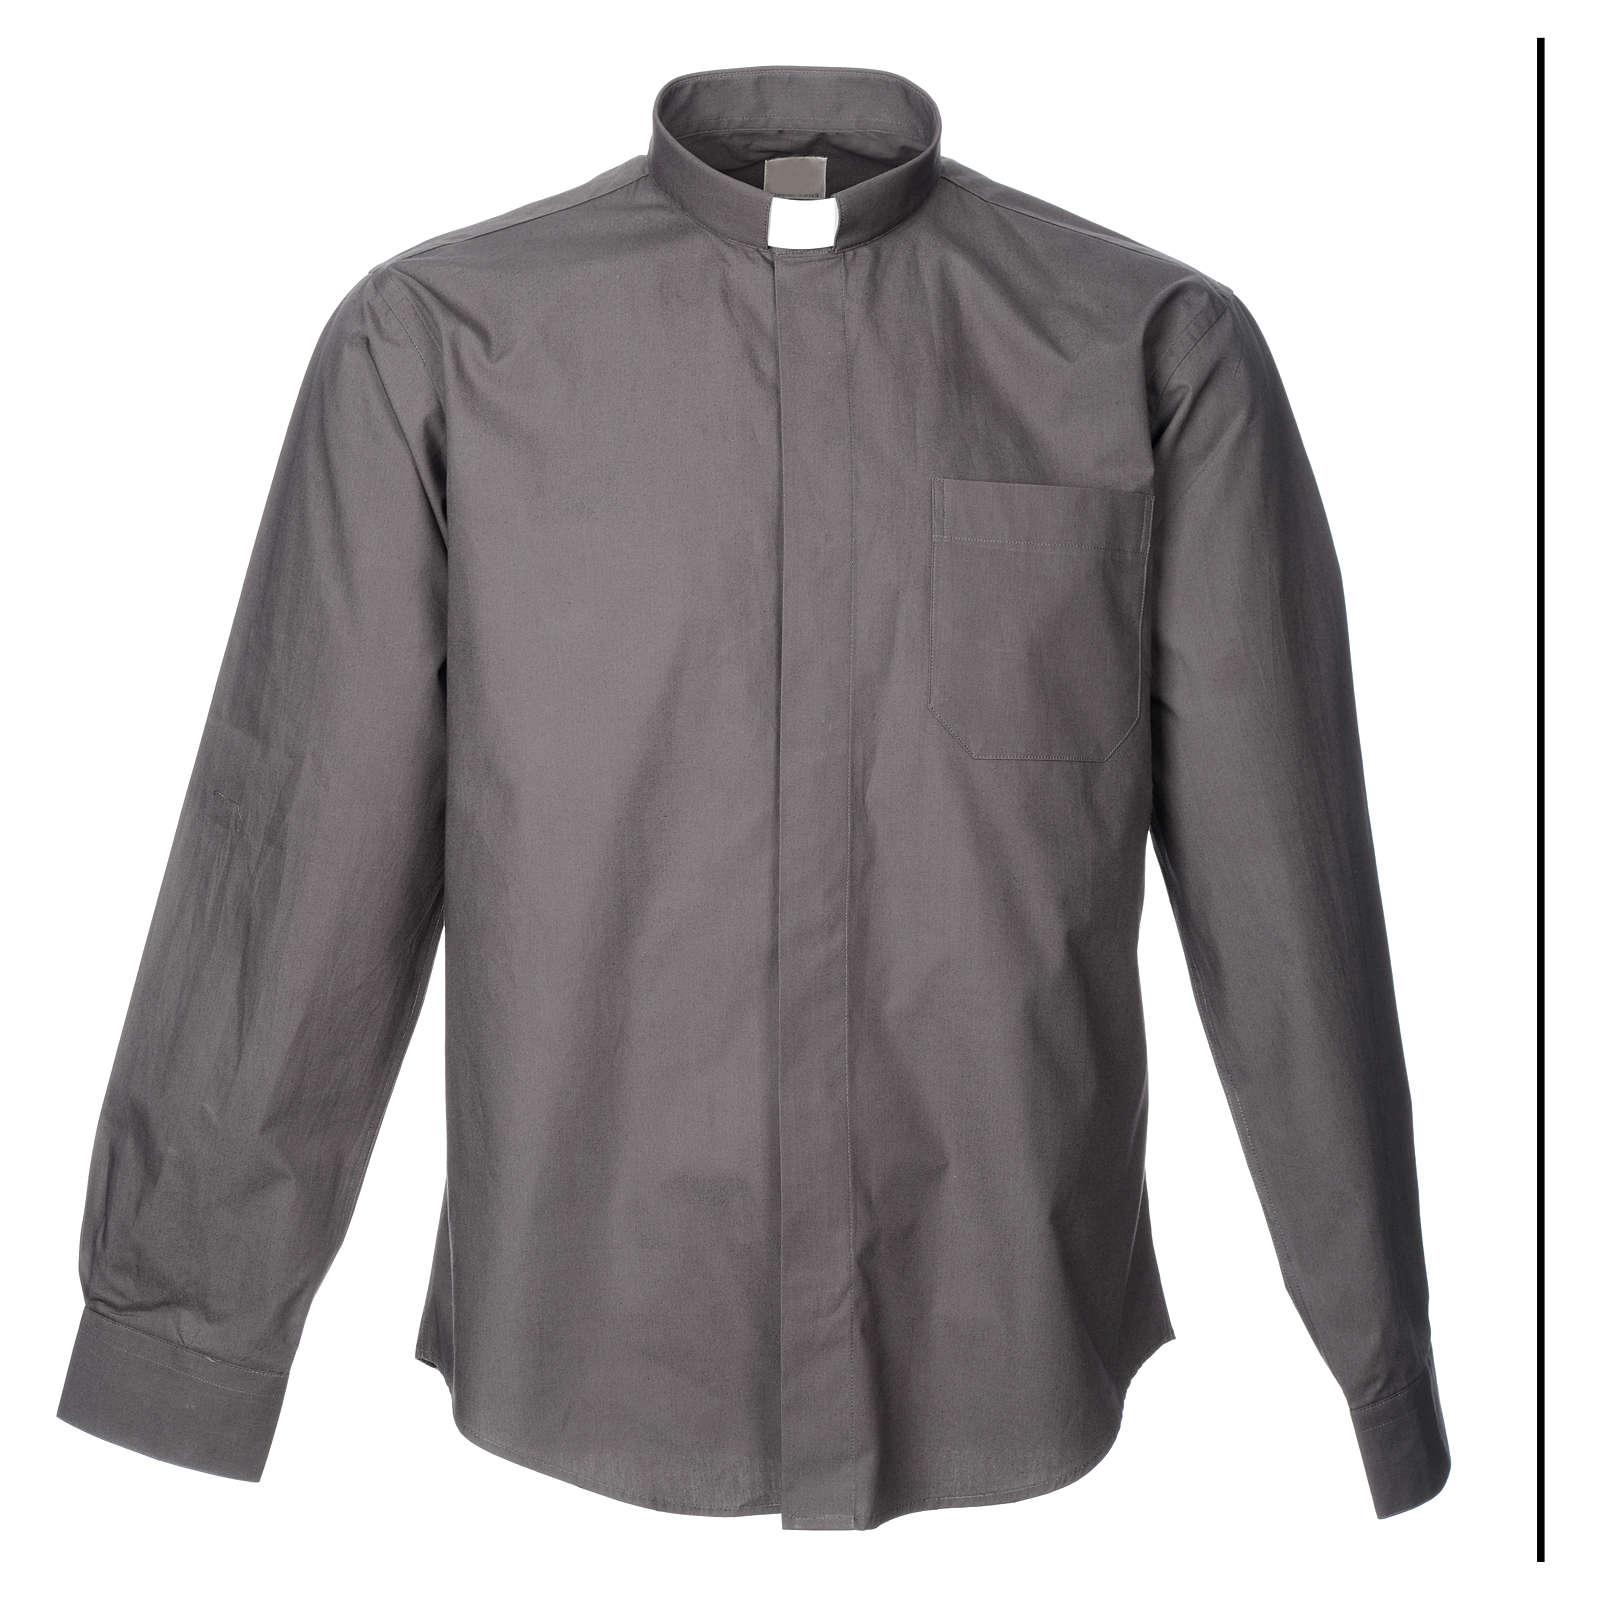 STOCK Camicia clergyman manica lunga popeline grigio scuro 4